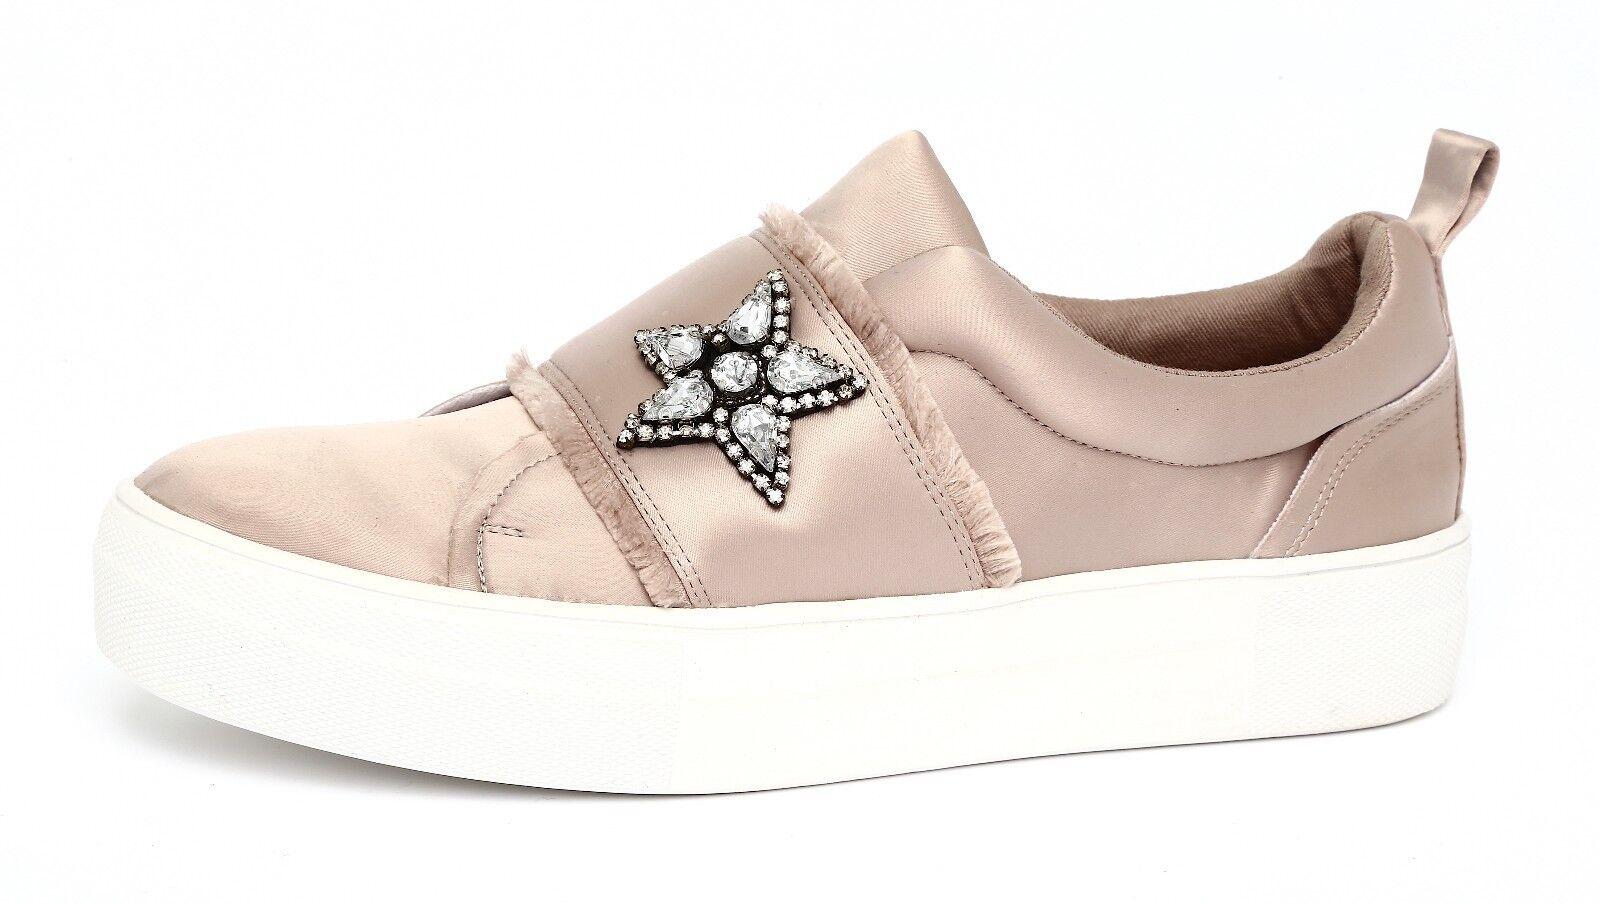 Steve Madden Women's Taupe Satin Graphic Fashion Sneaker Sz 8.5M 4633